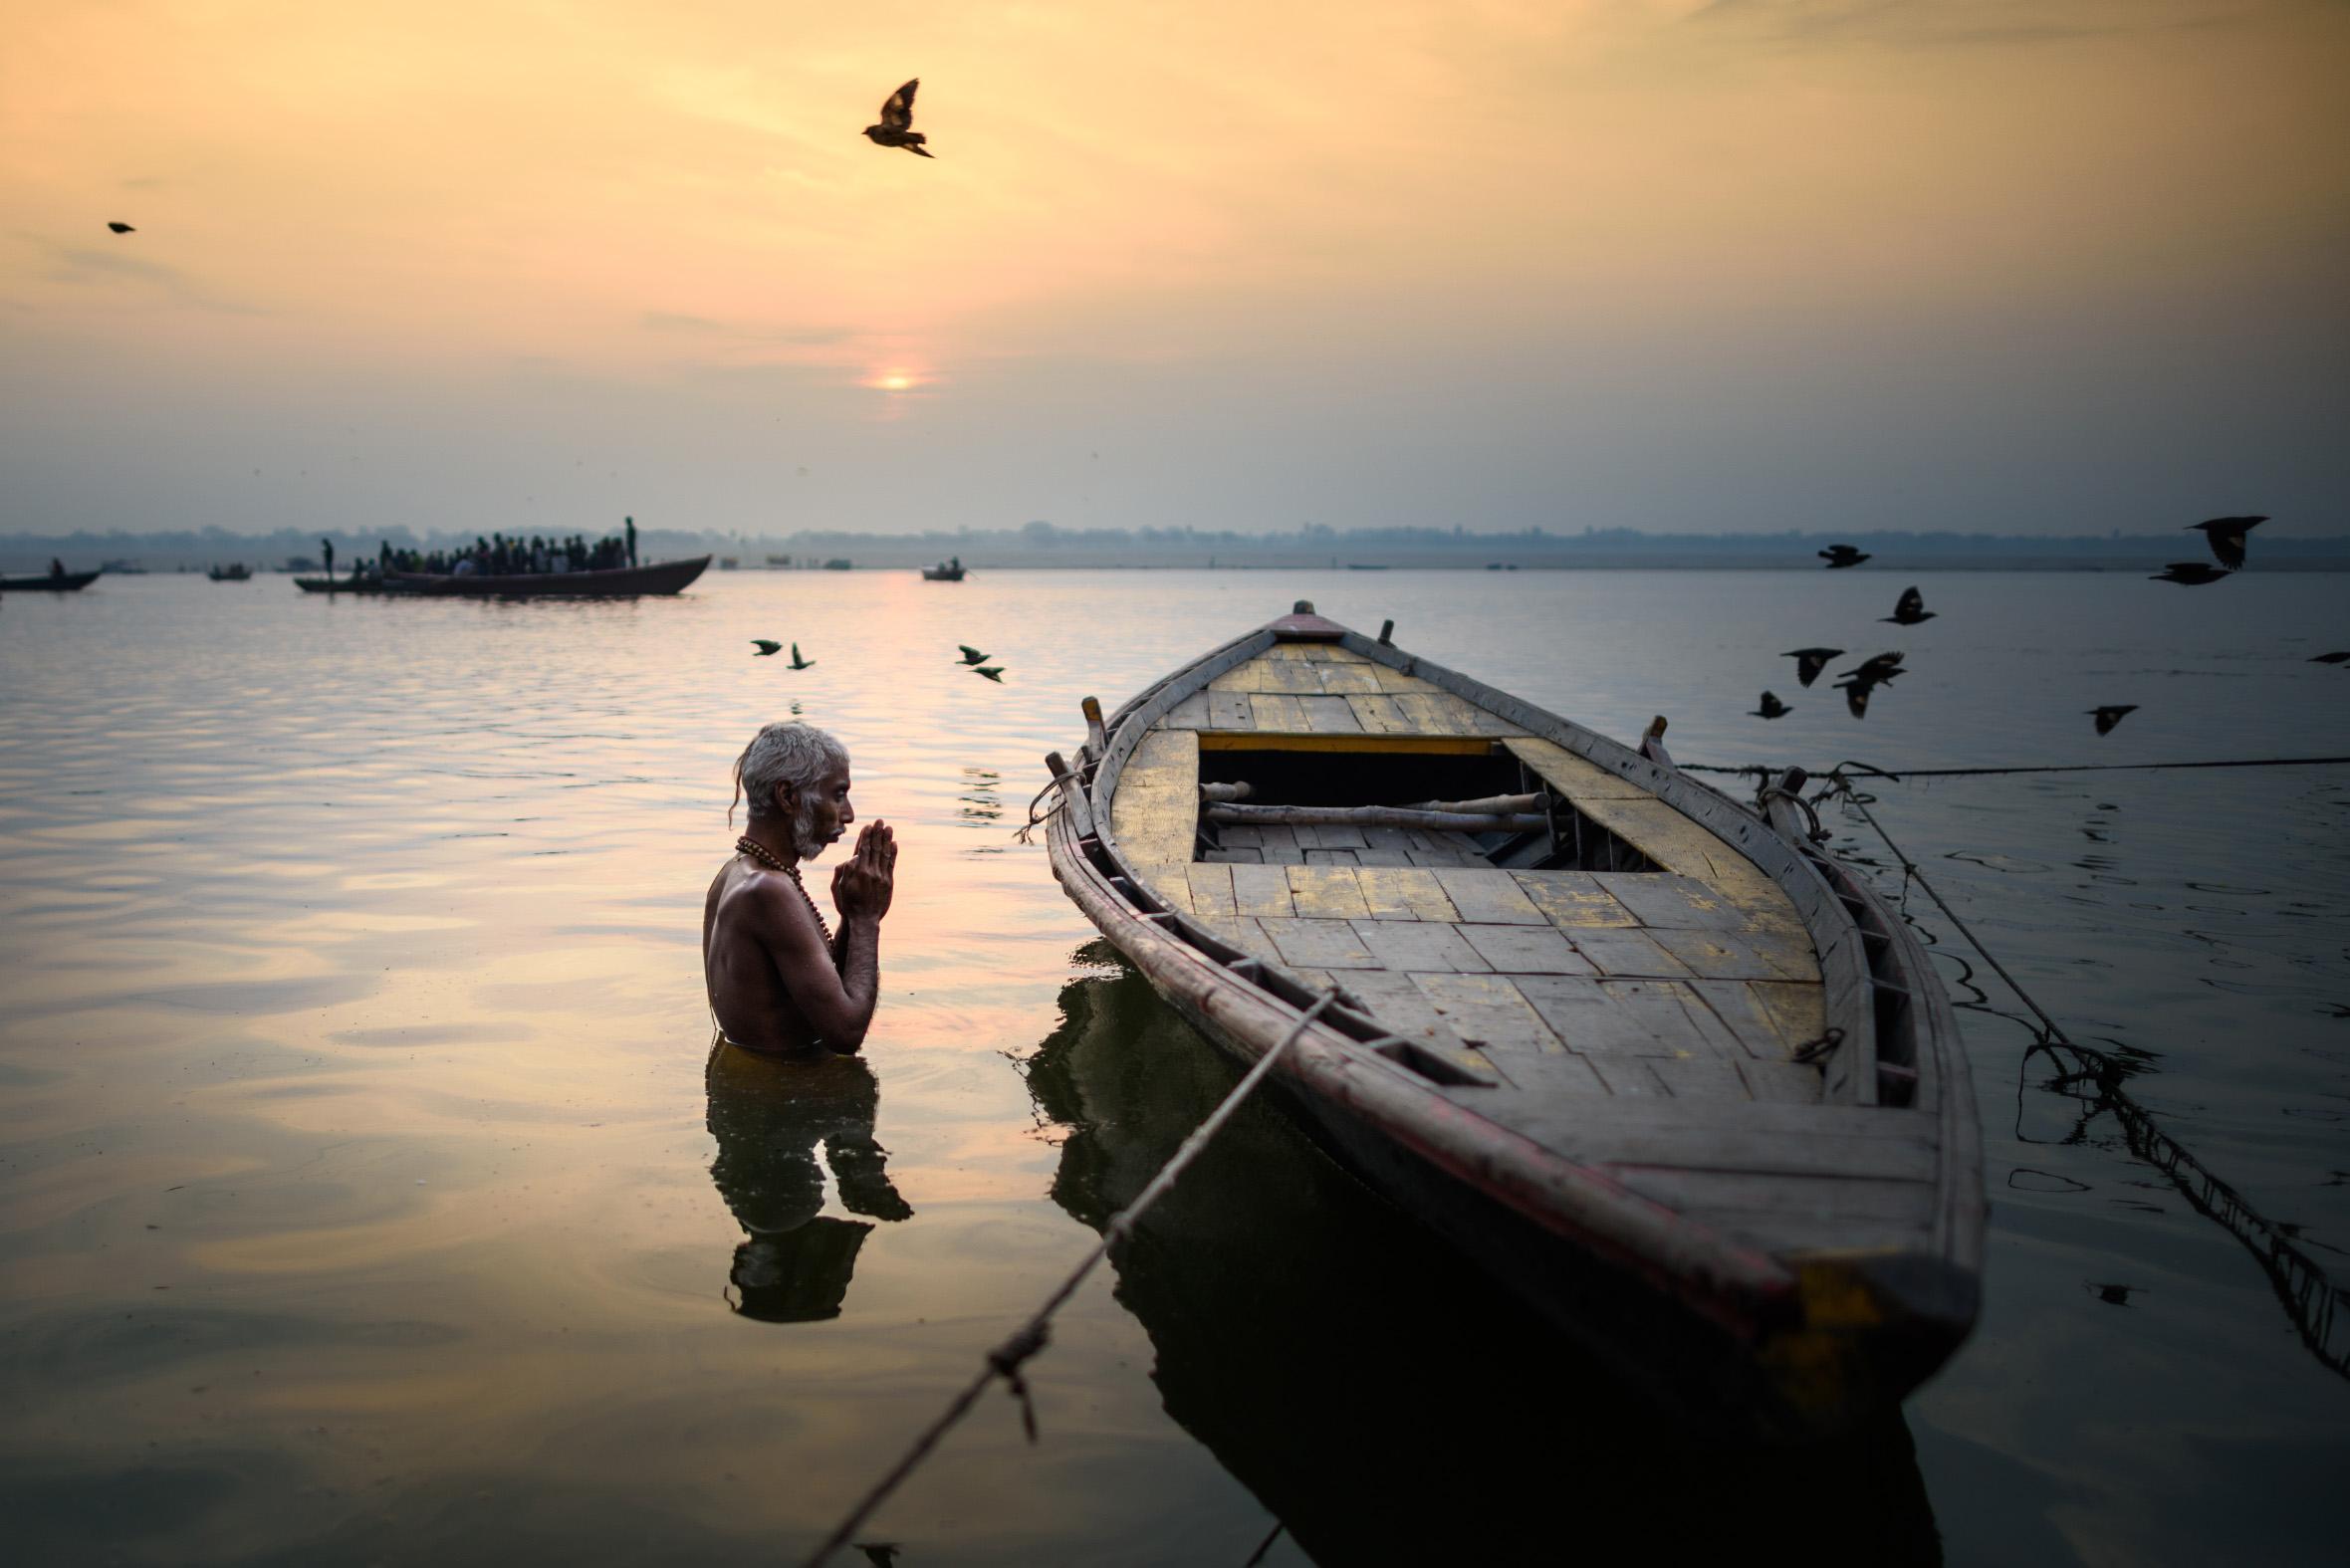 INDIA-Varanasi-ALVA008.jpg